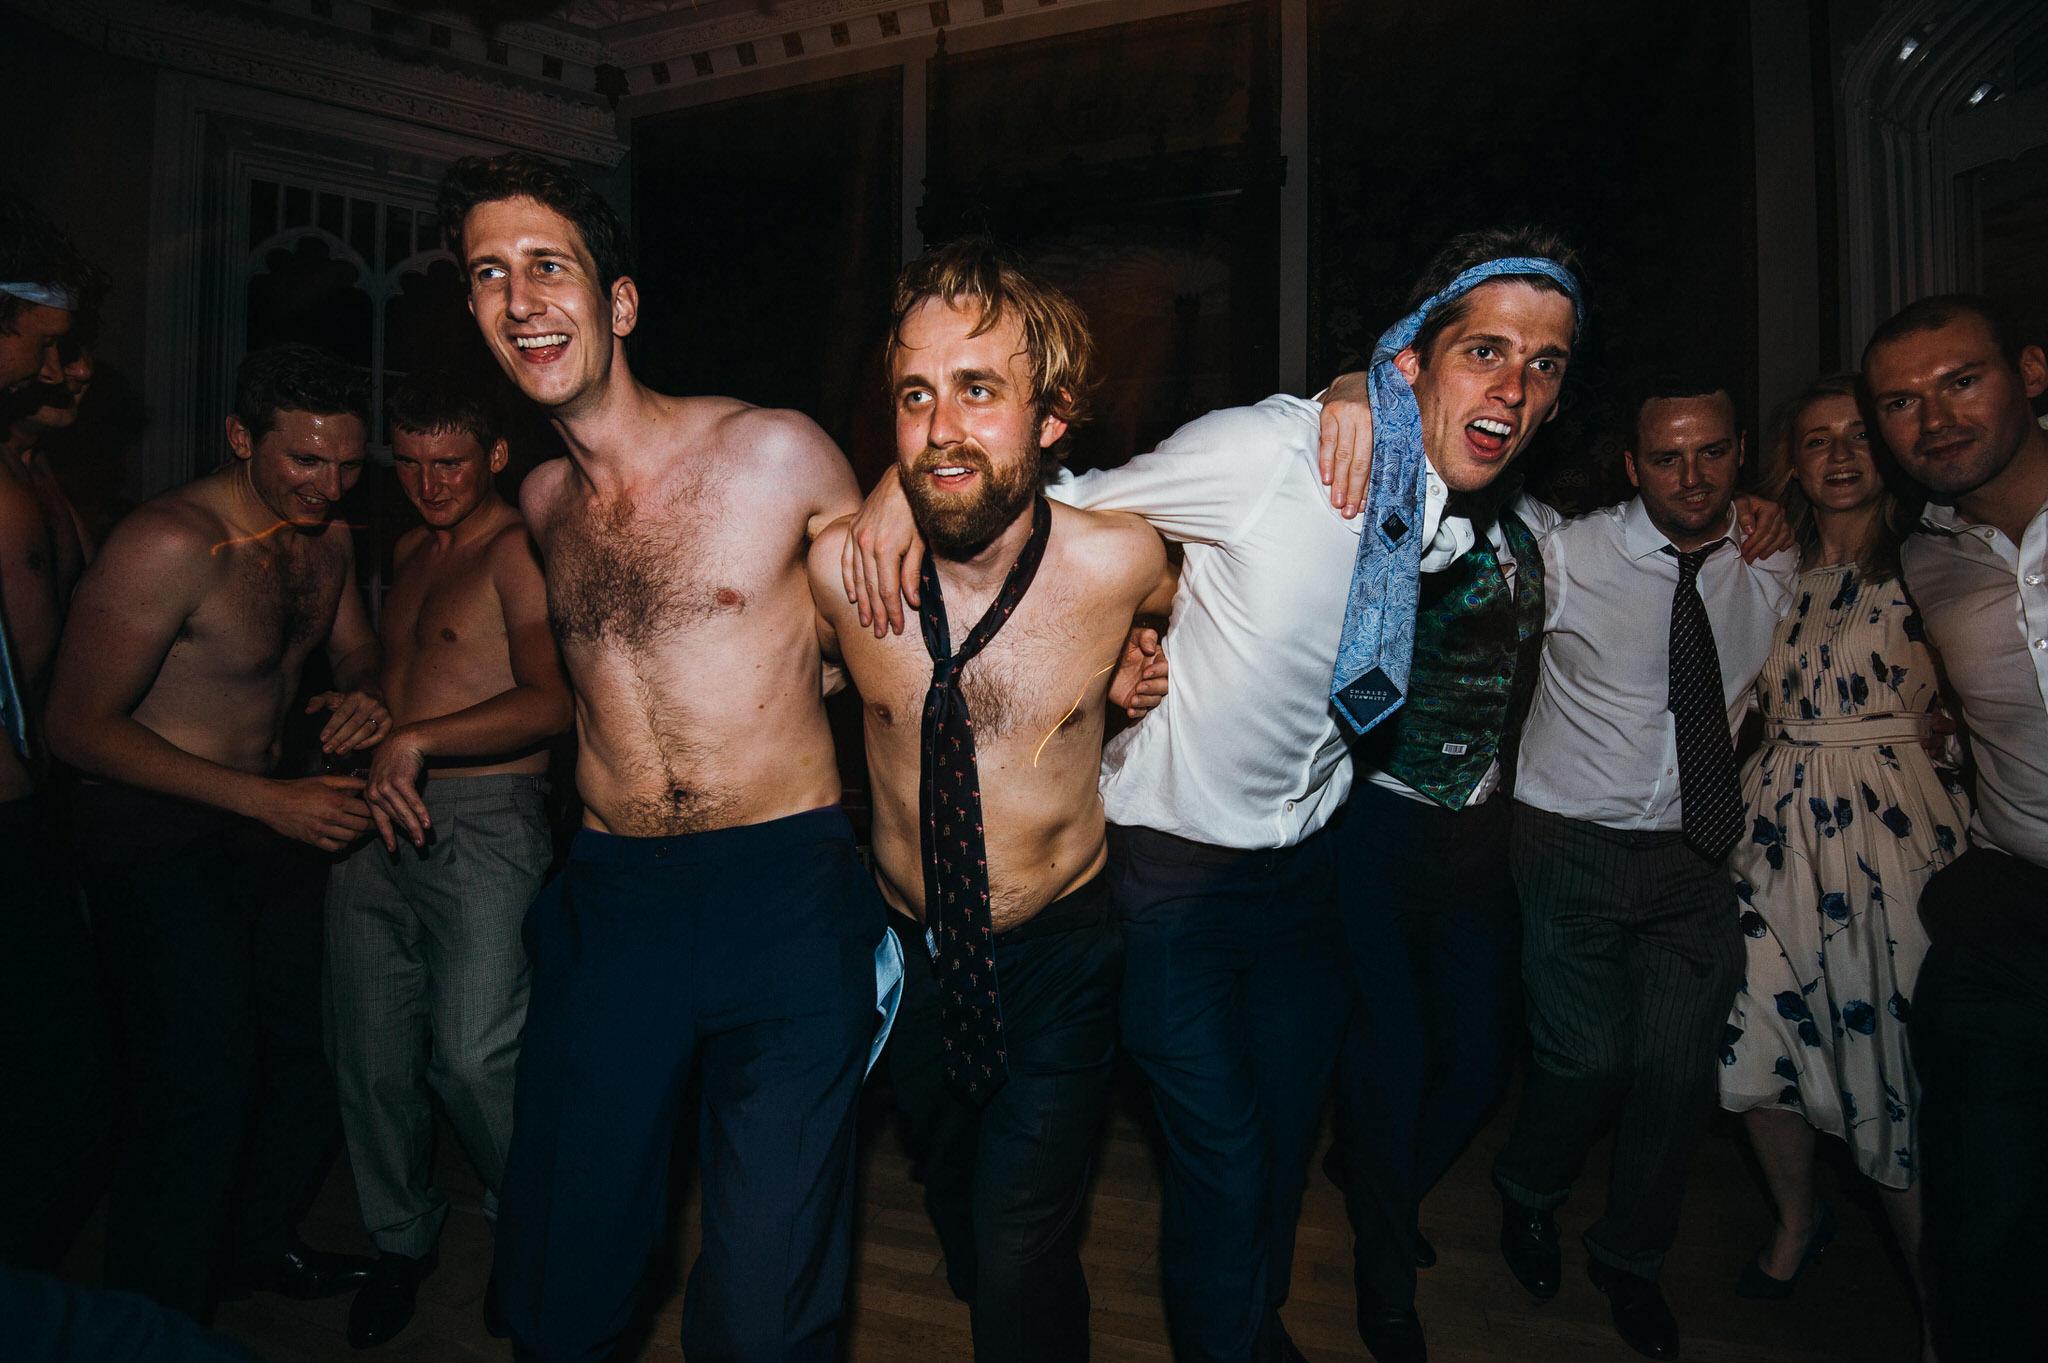 Topless guys at wedding